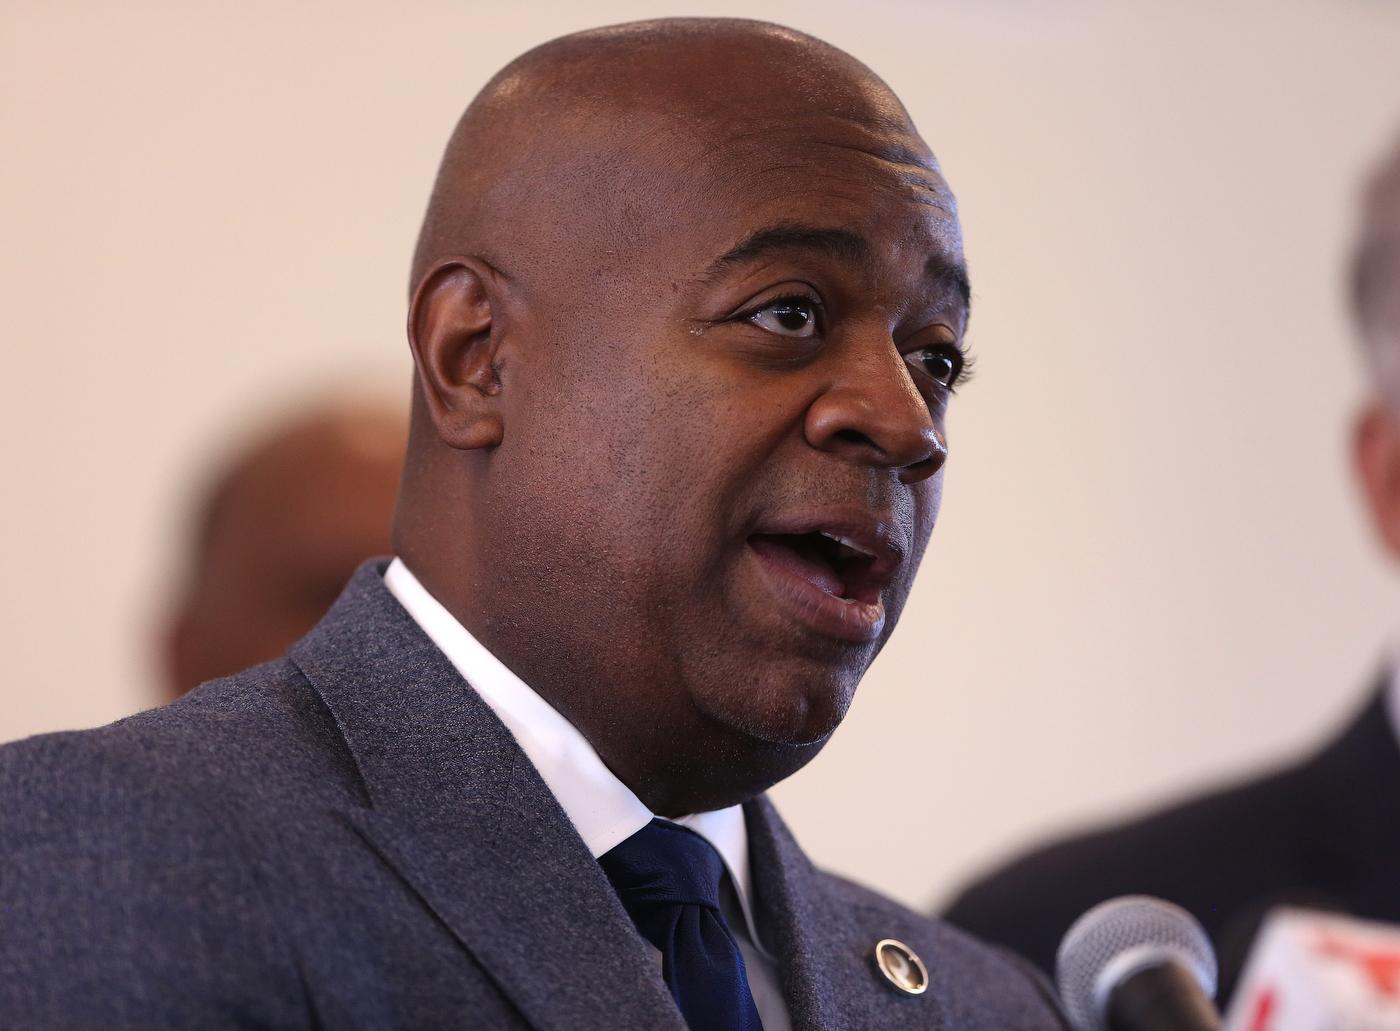 Baraka sees racial animus, but Newark's denials on lead echo those in Flint | Moran